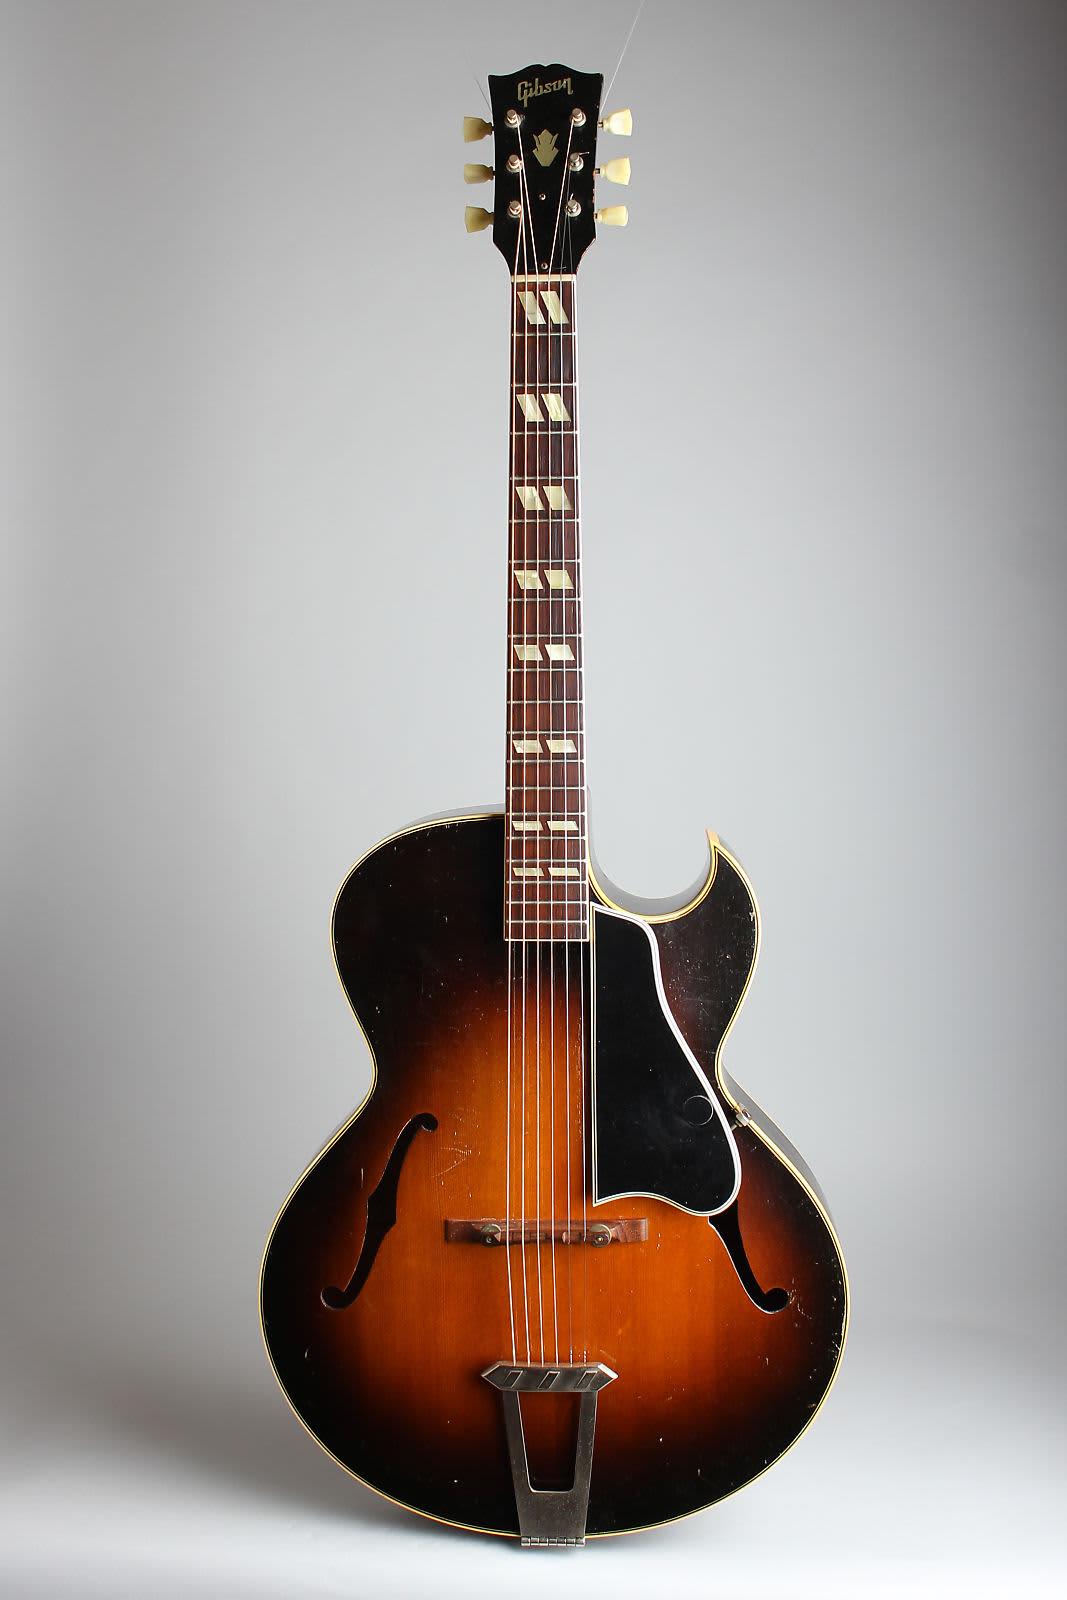 Gibson Acoustic Guitar : gibson l 4c arch top acoustic guitar 1950 ser a 5142 reverb ~ Russianpoet.info Haus und Dekorationen